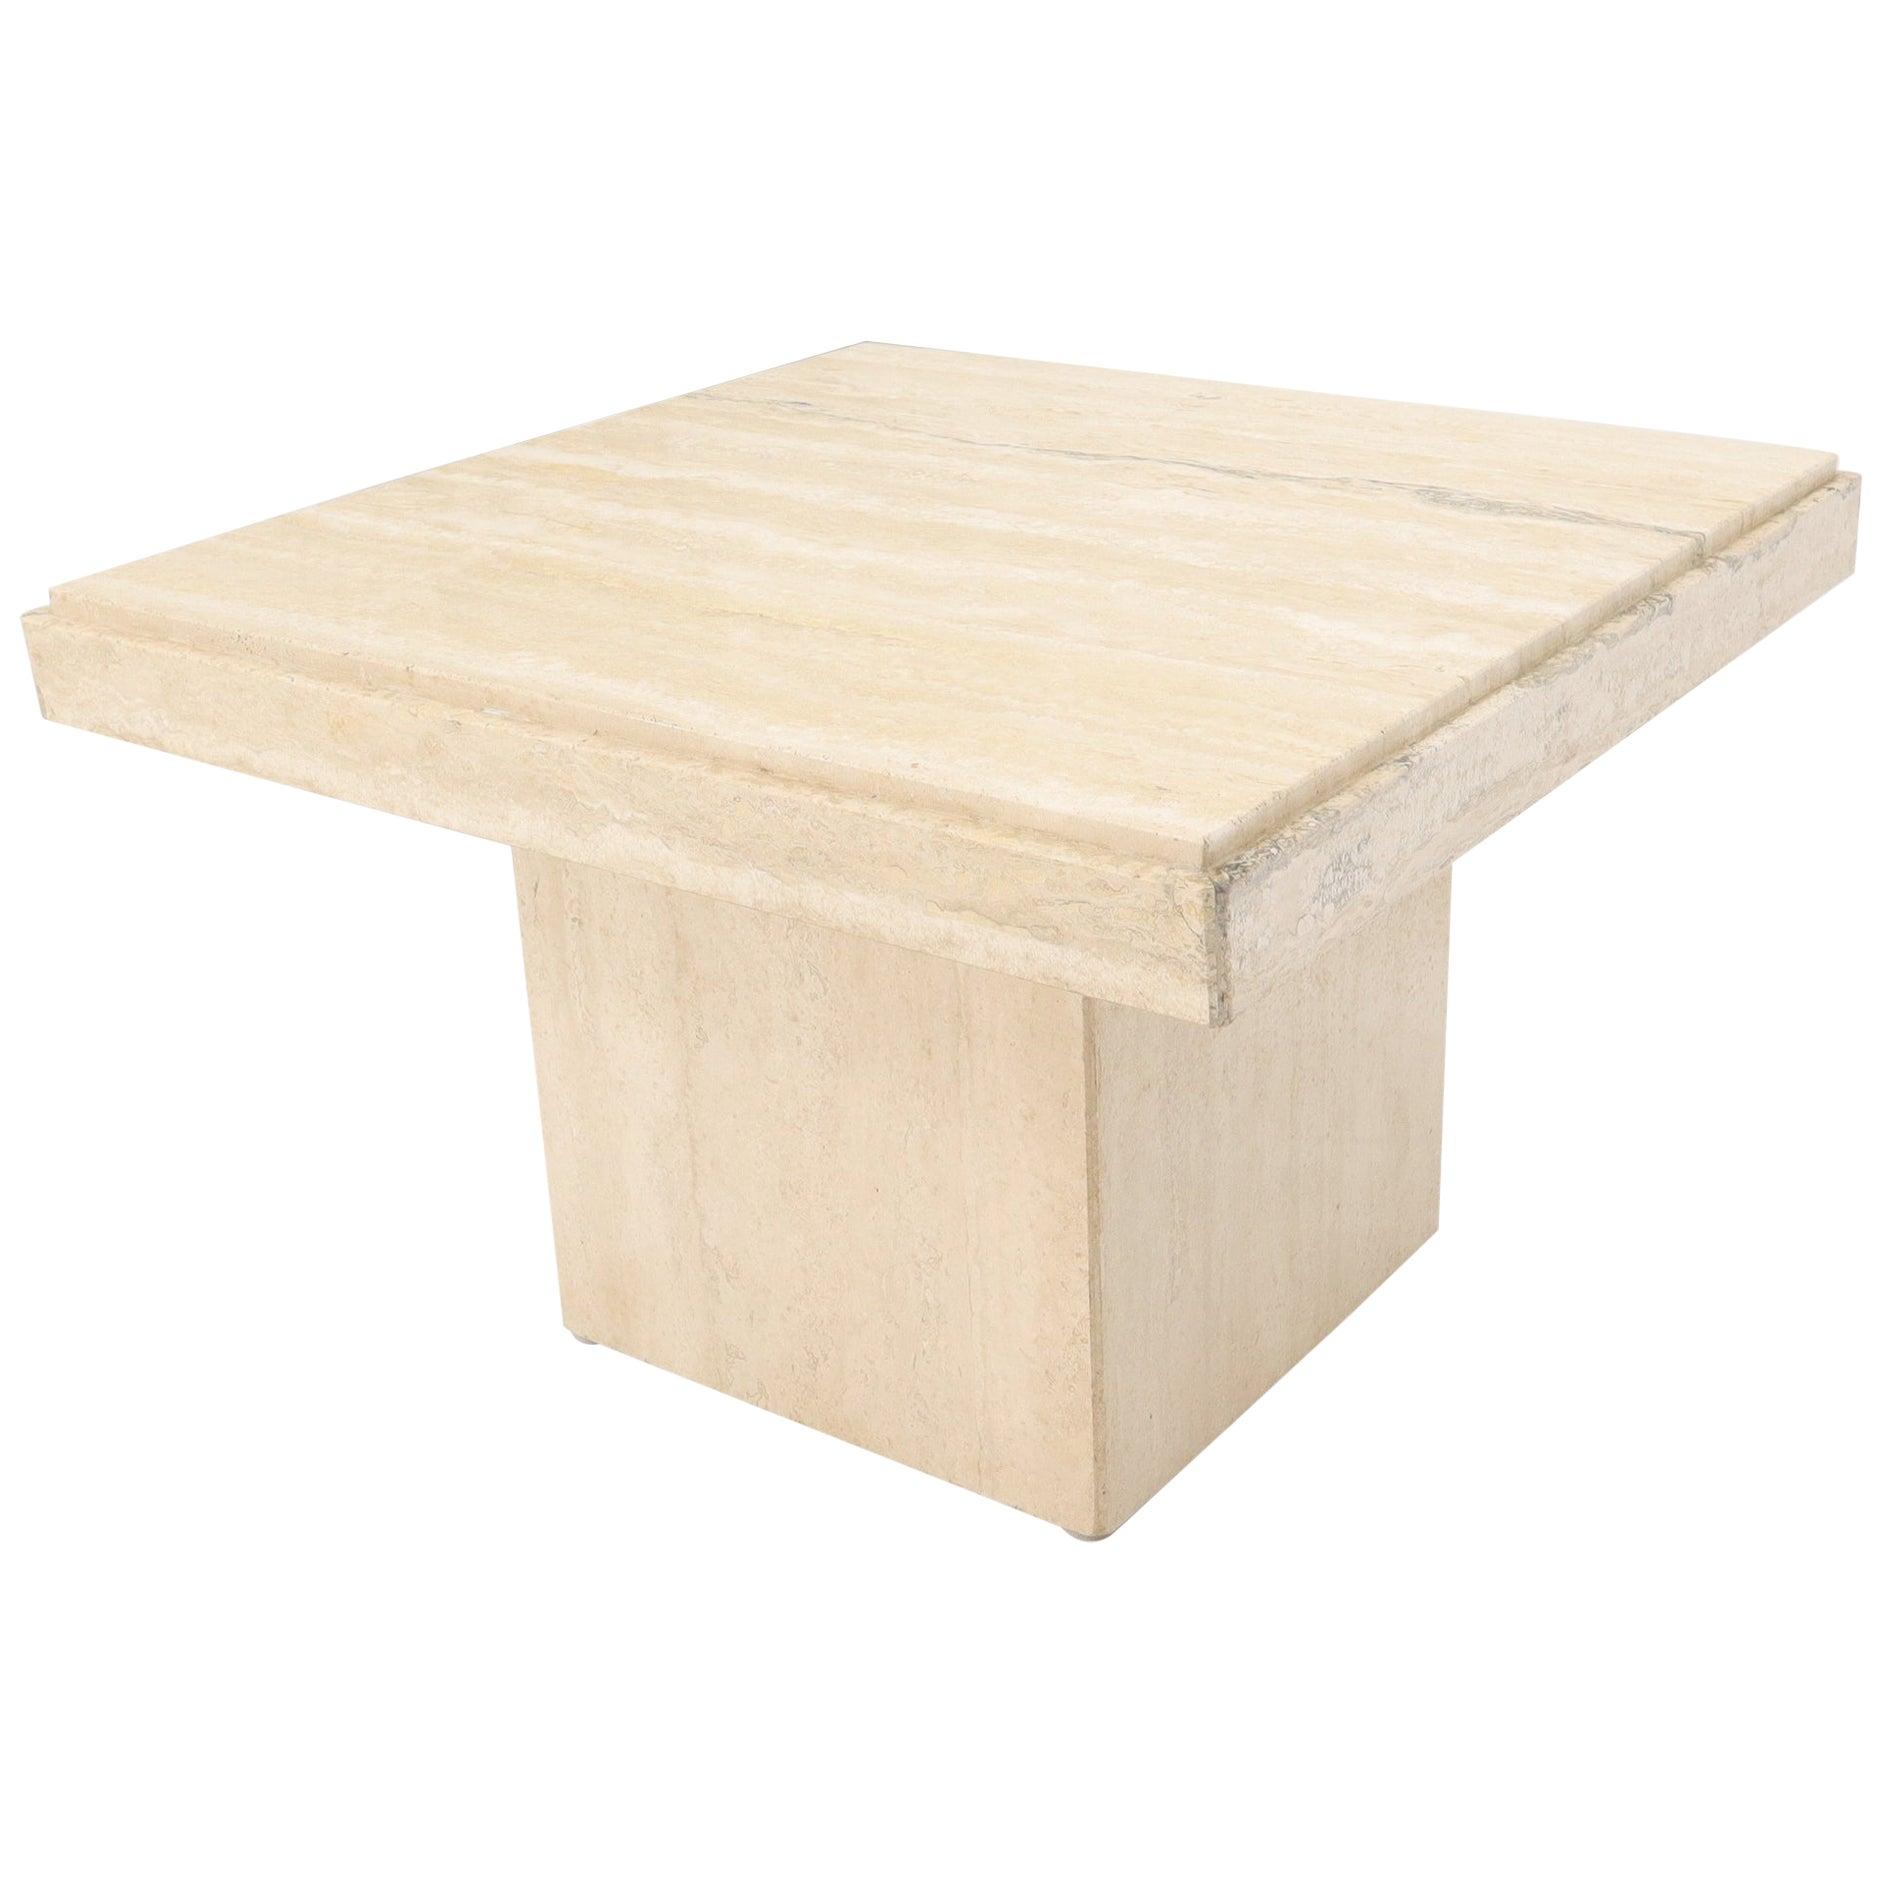 Square Italian Mid-Century Modern Travertine Side Table